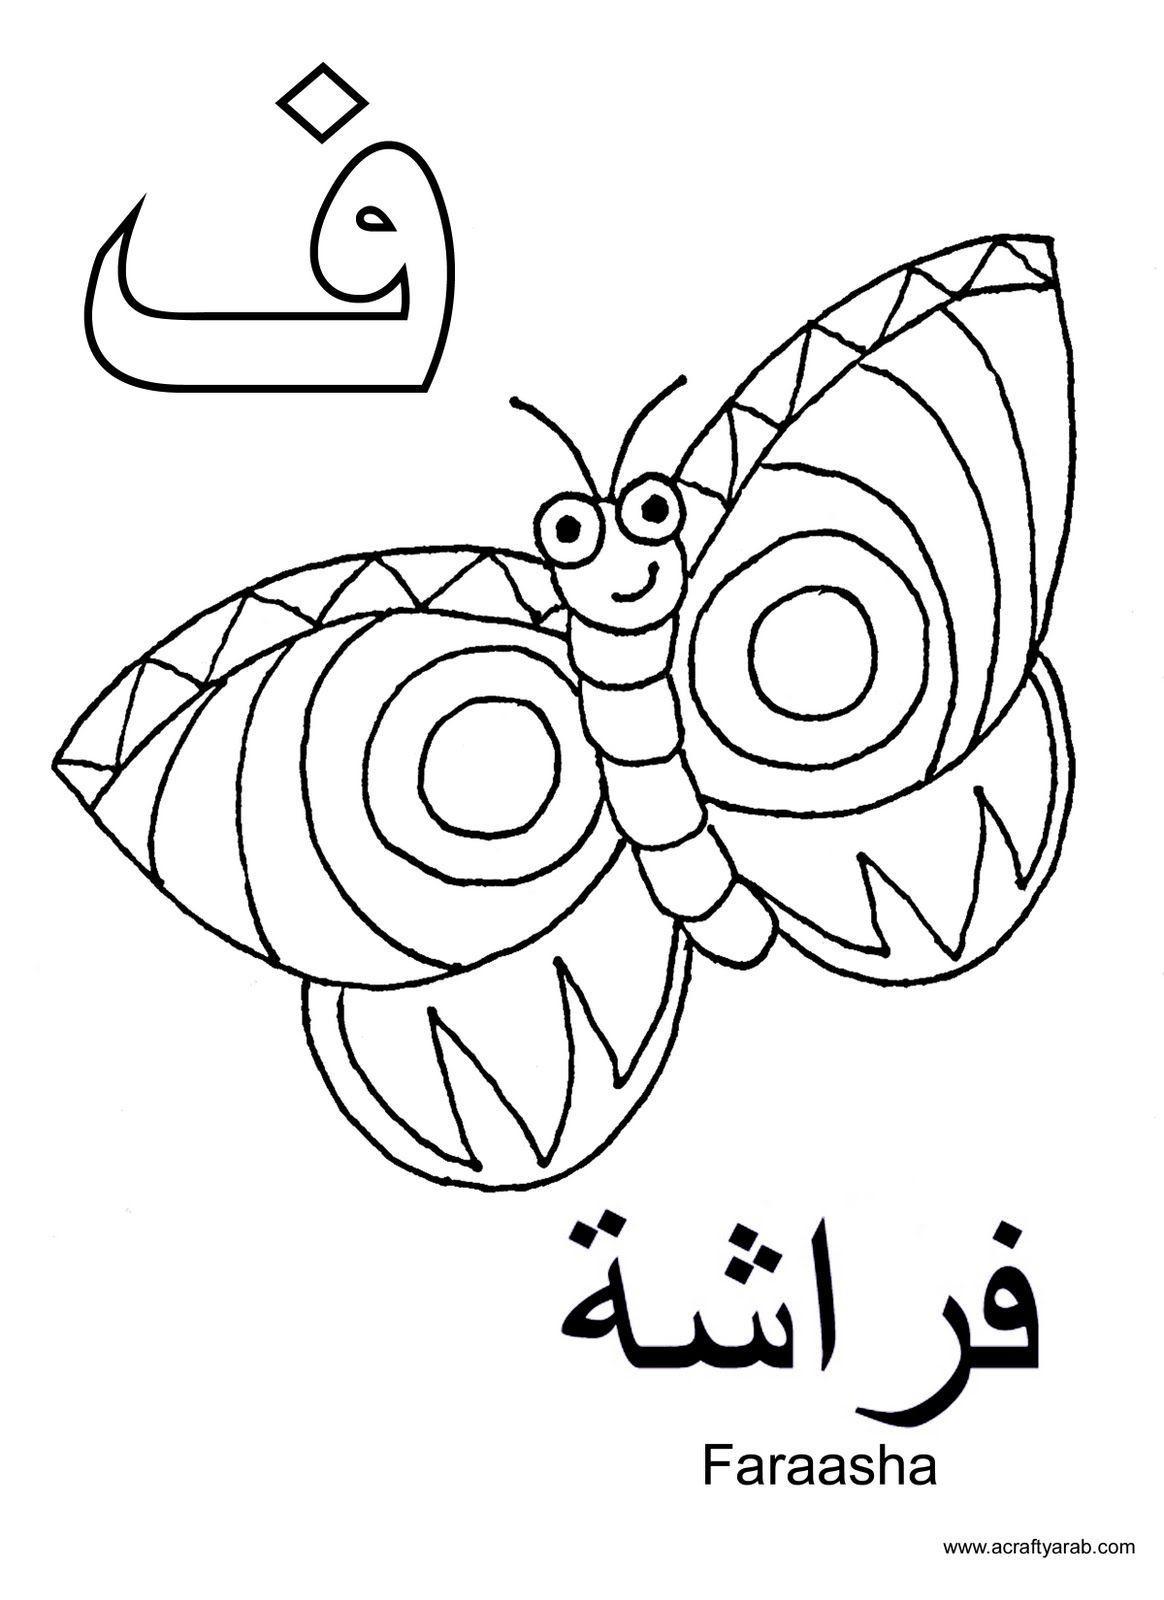 A Crafty Arab Arabic Alphabet Coloring Pages Fa Is For Faraasha Learnarabicforkids Arabic Alphabet Alphabet Coloring Pages Alphabet Coloring